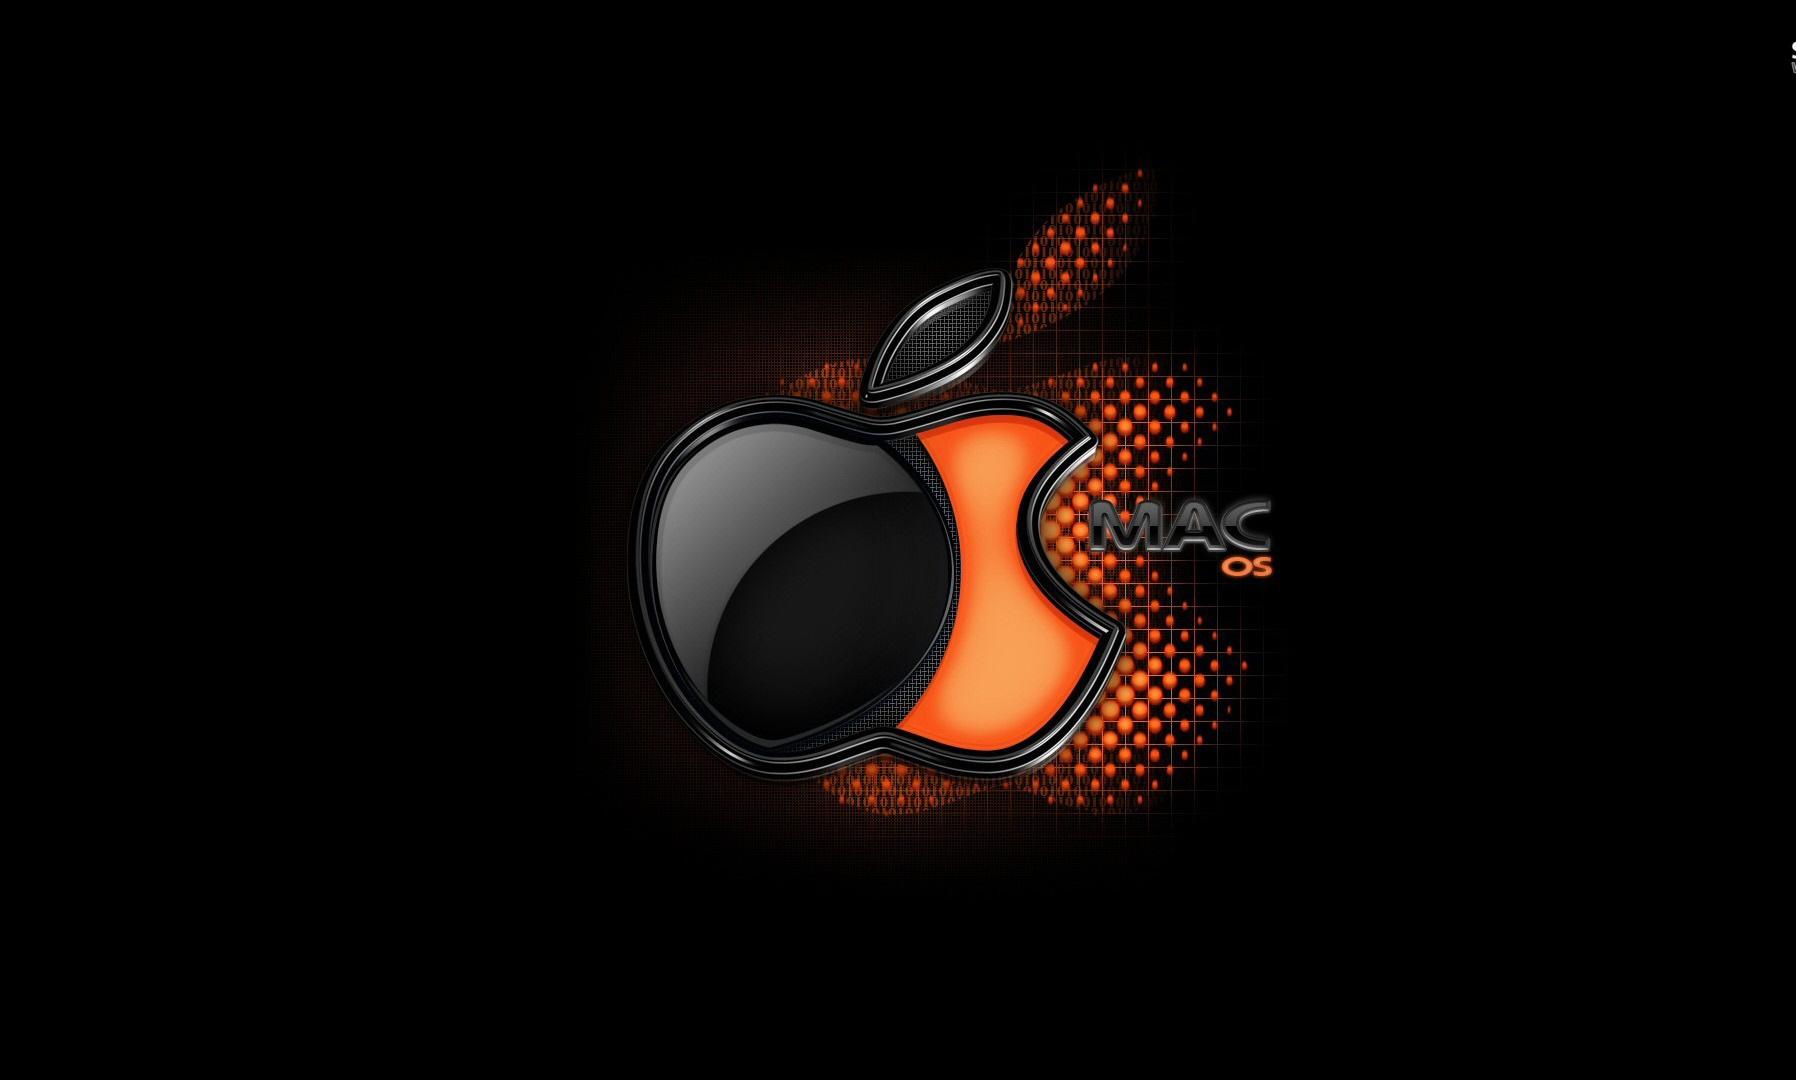 50 mac wallpapersbackgrounds in hd for free download mac wallpaper 16 voltagebd Gallery